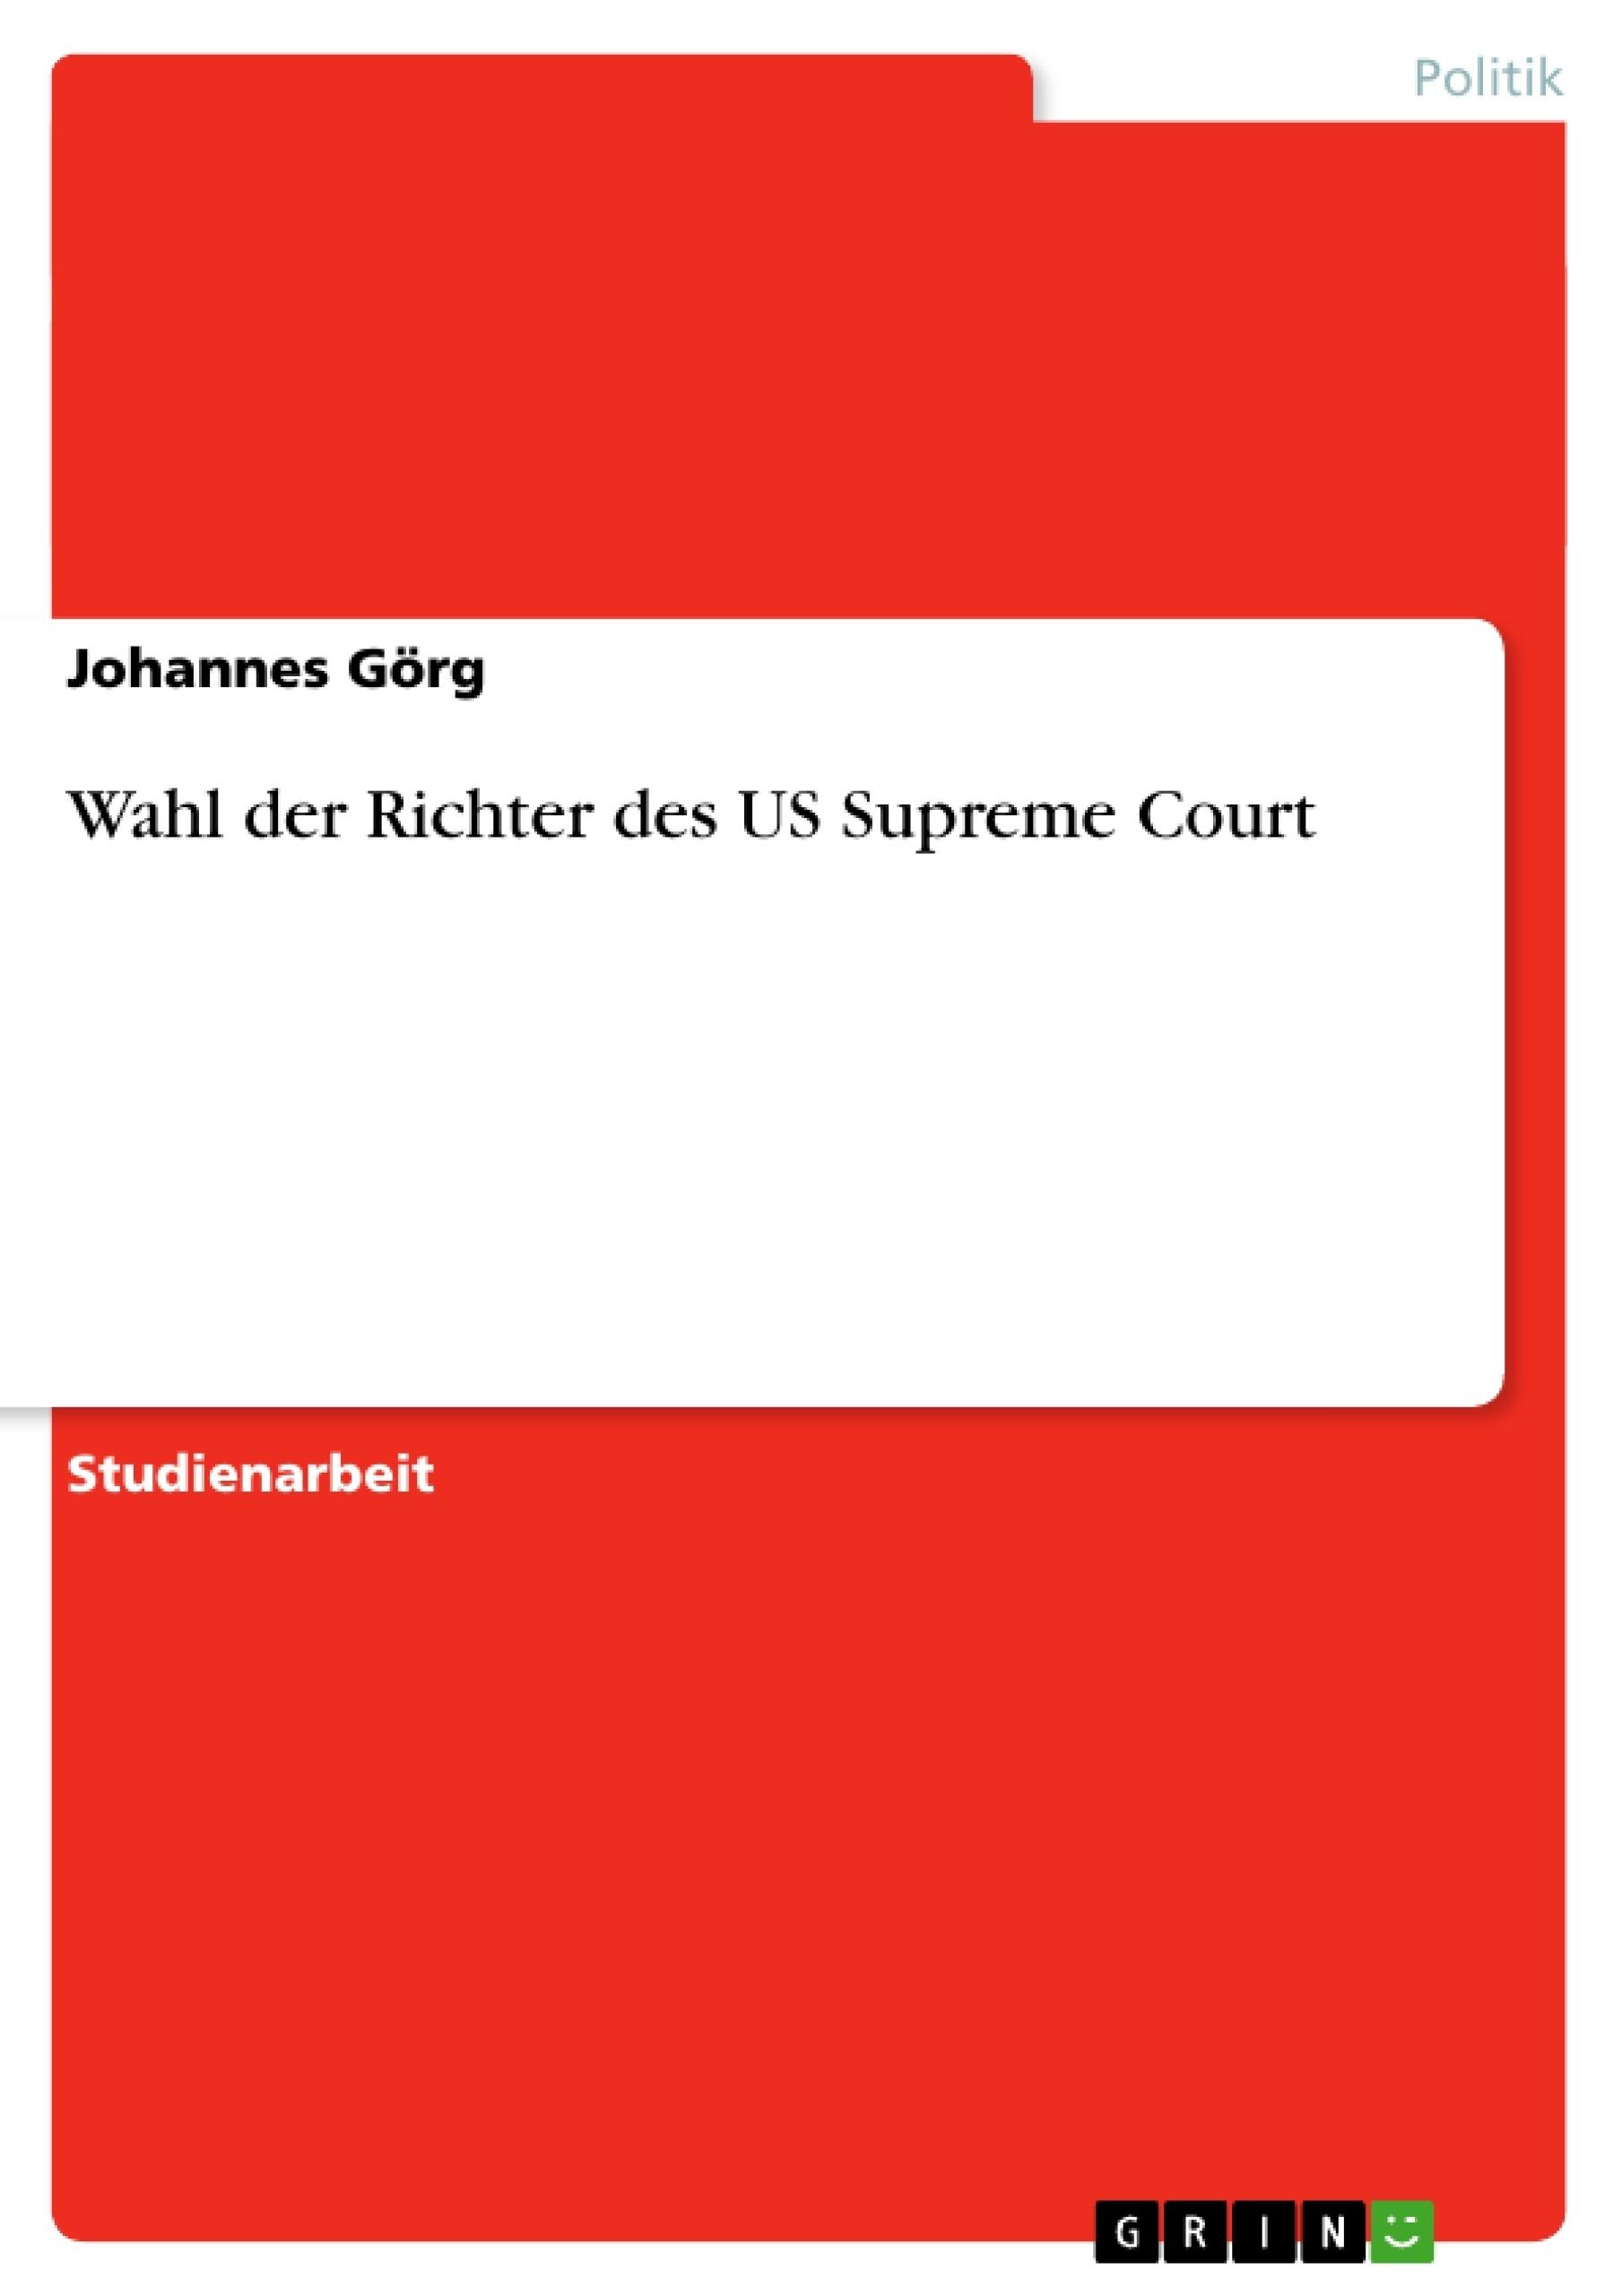 Titel: Wahl der Richter des US Supreme Court